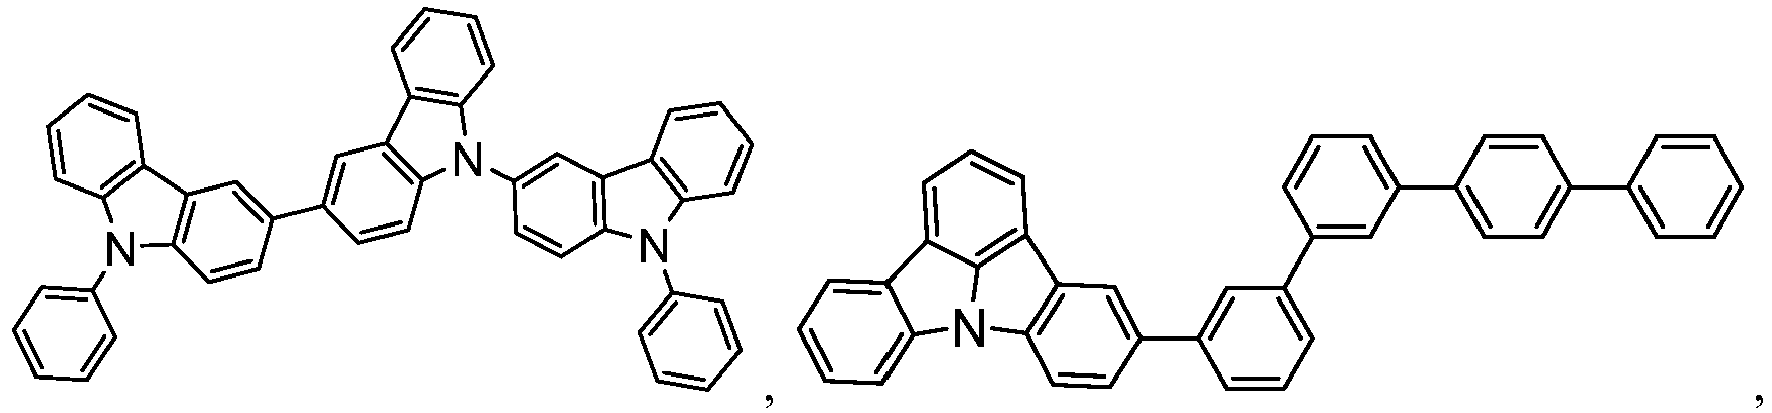 Figure imgb0898